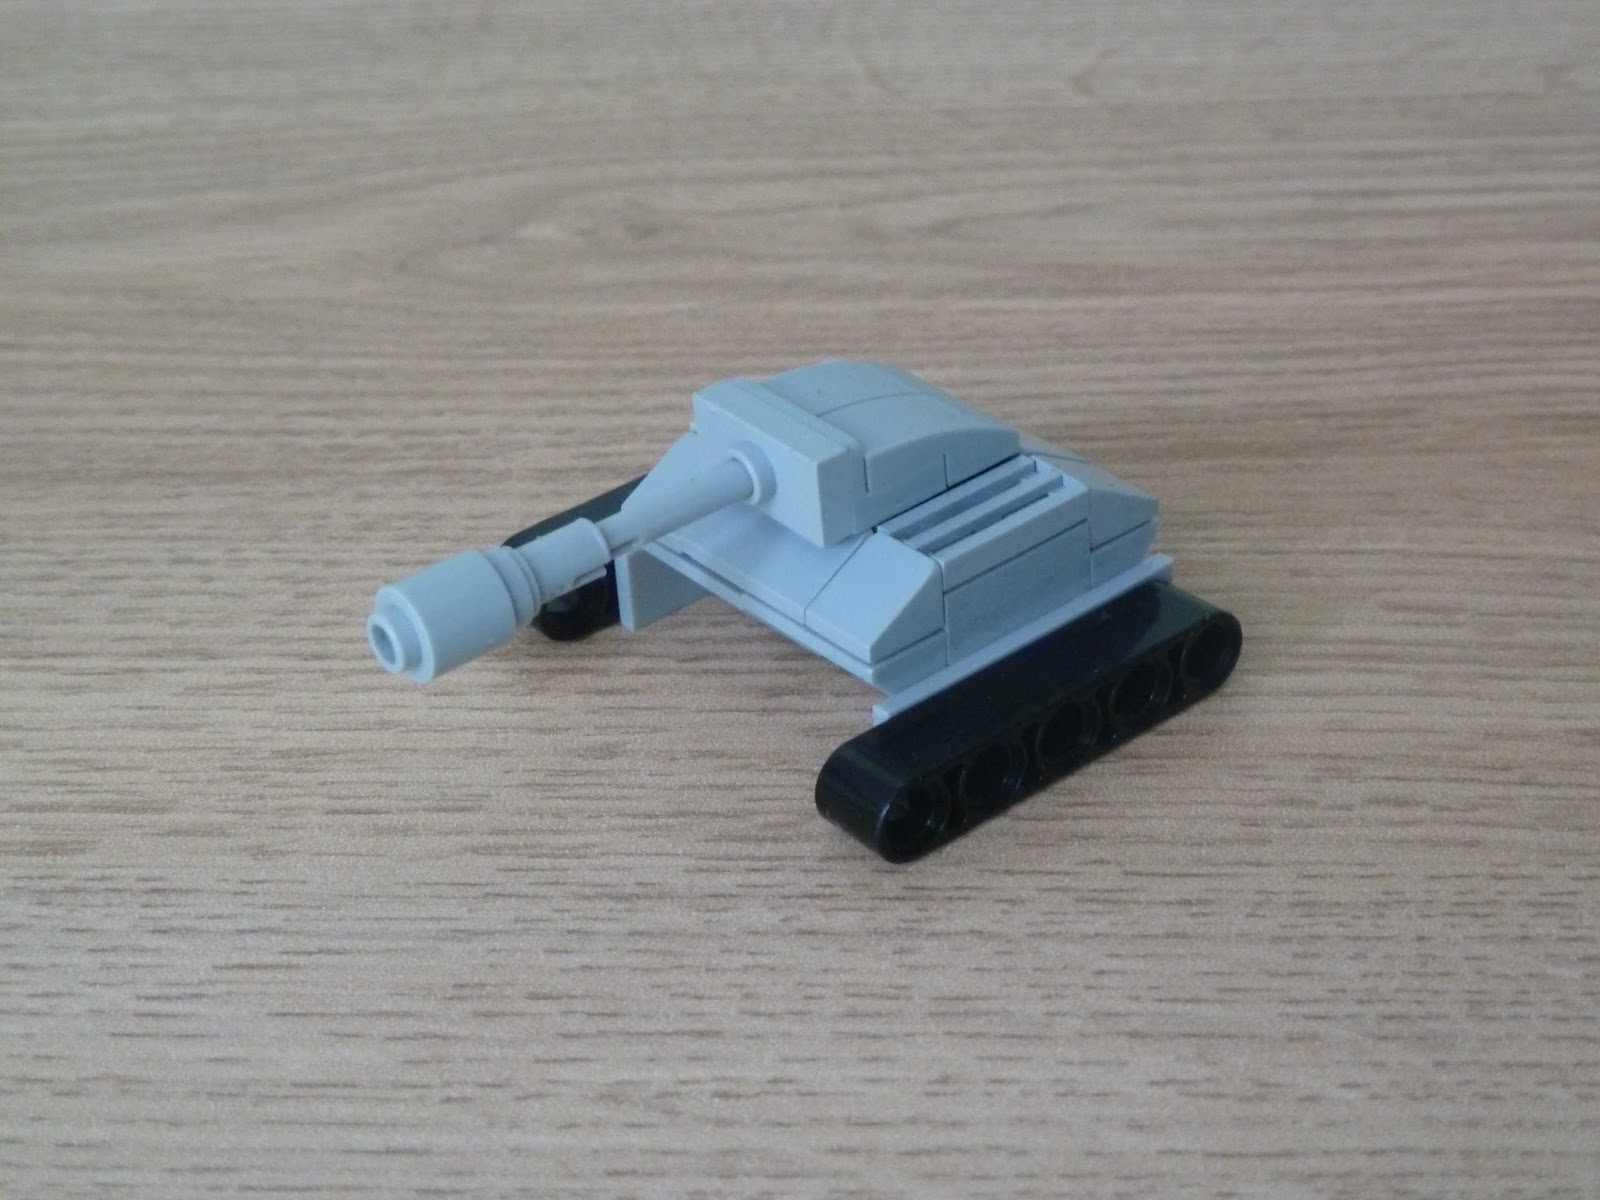 Totobricks Lego How To Build A Mini Tank Moc Micro Build Instructions